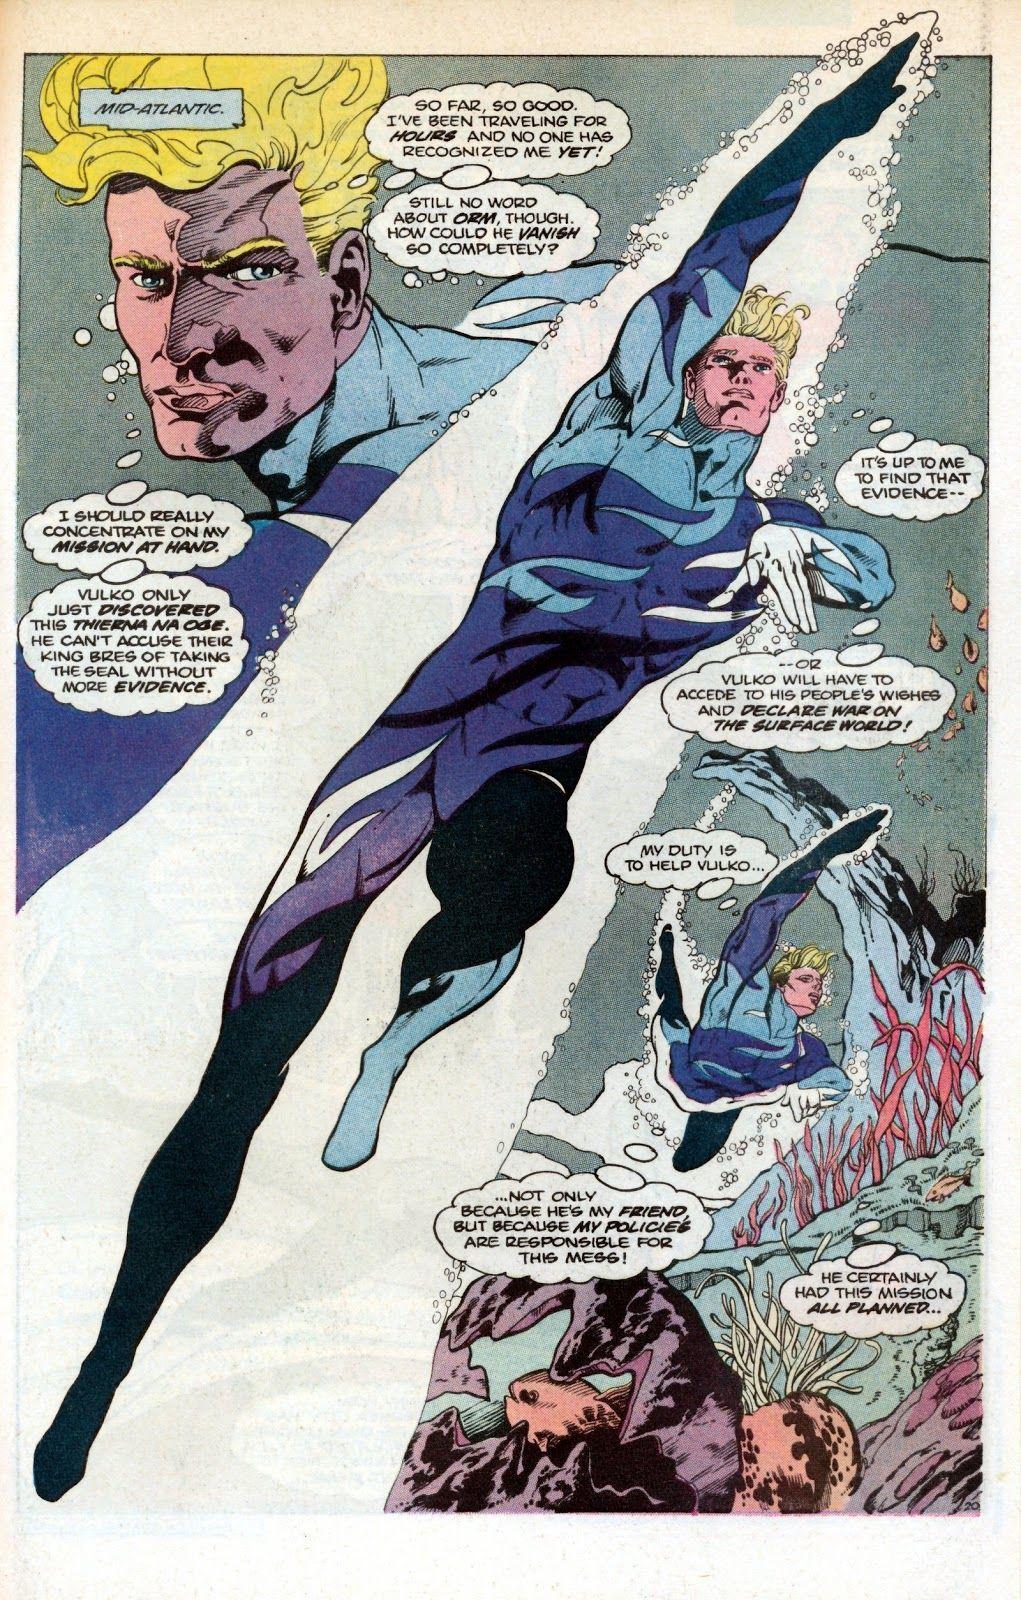 Aquaman #1 (1986) by Neal Pozner and Craig Hamilton.